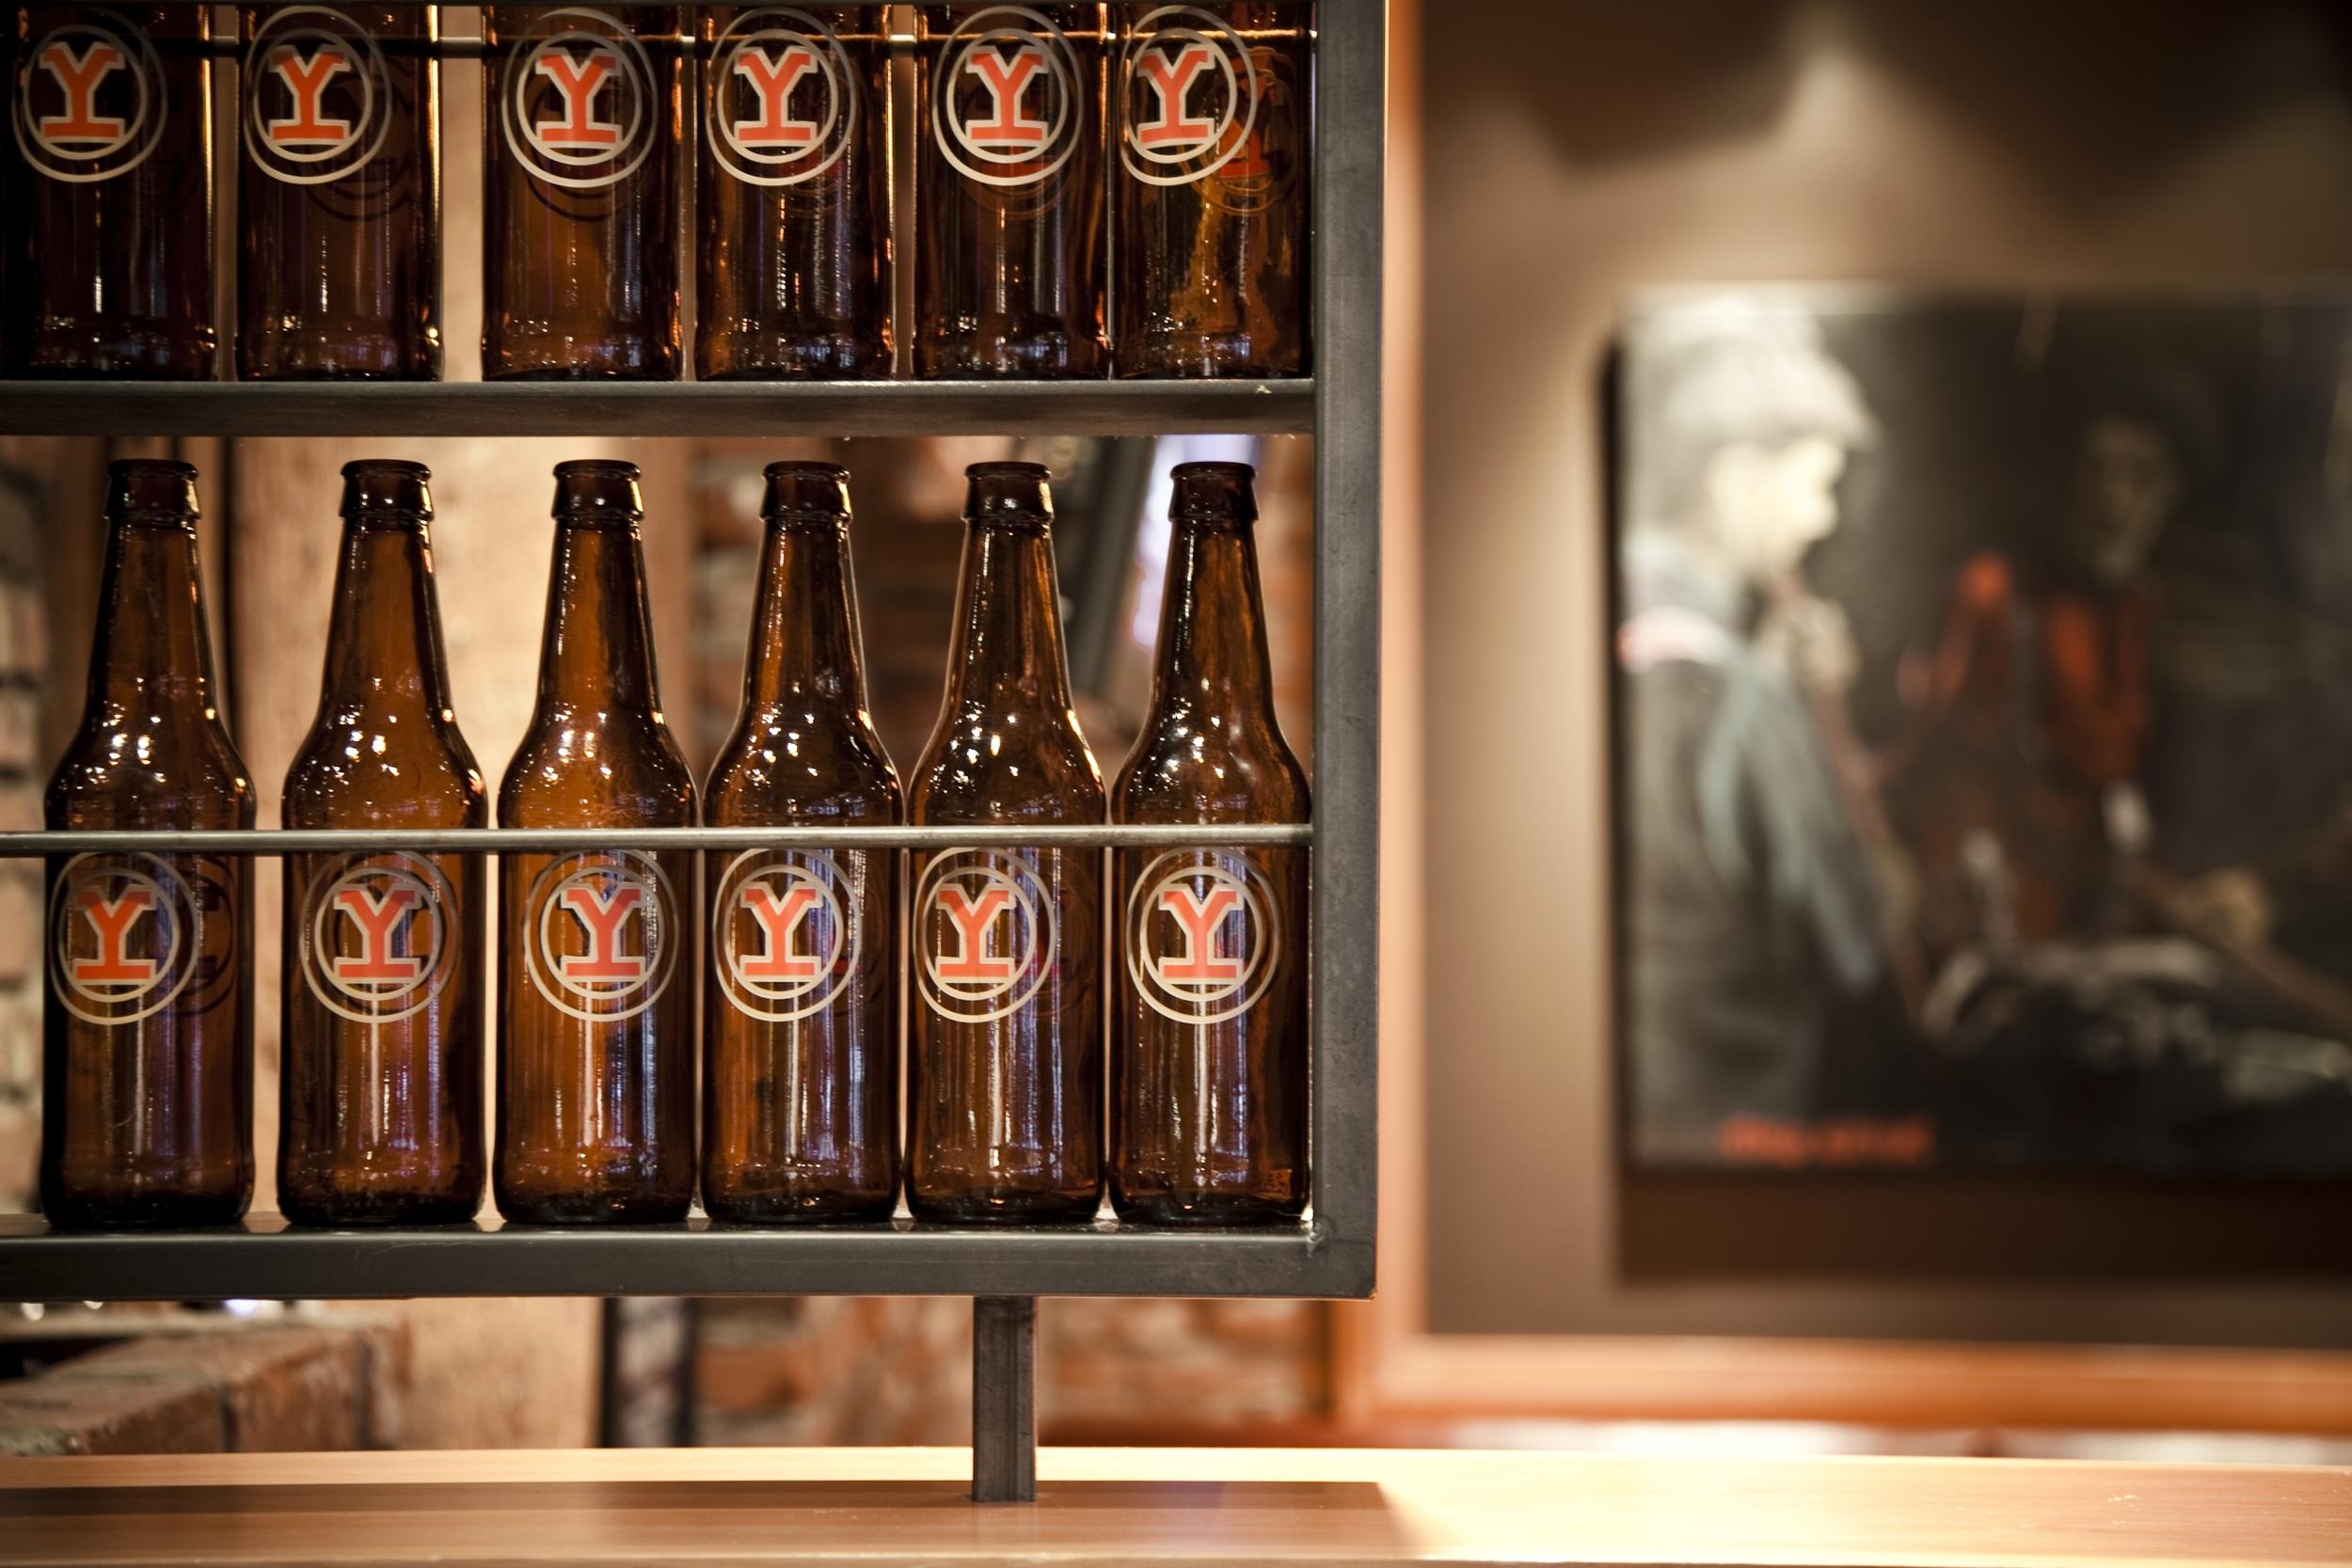 N3_20101115_4629-Box-YT Brewery.jpg